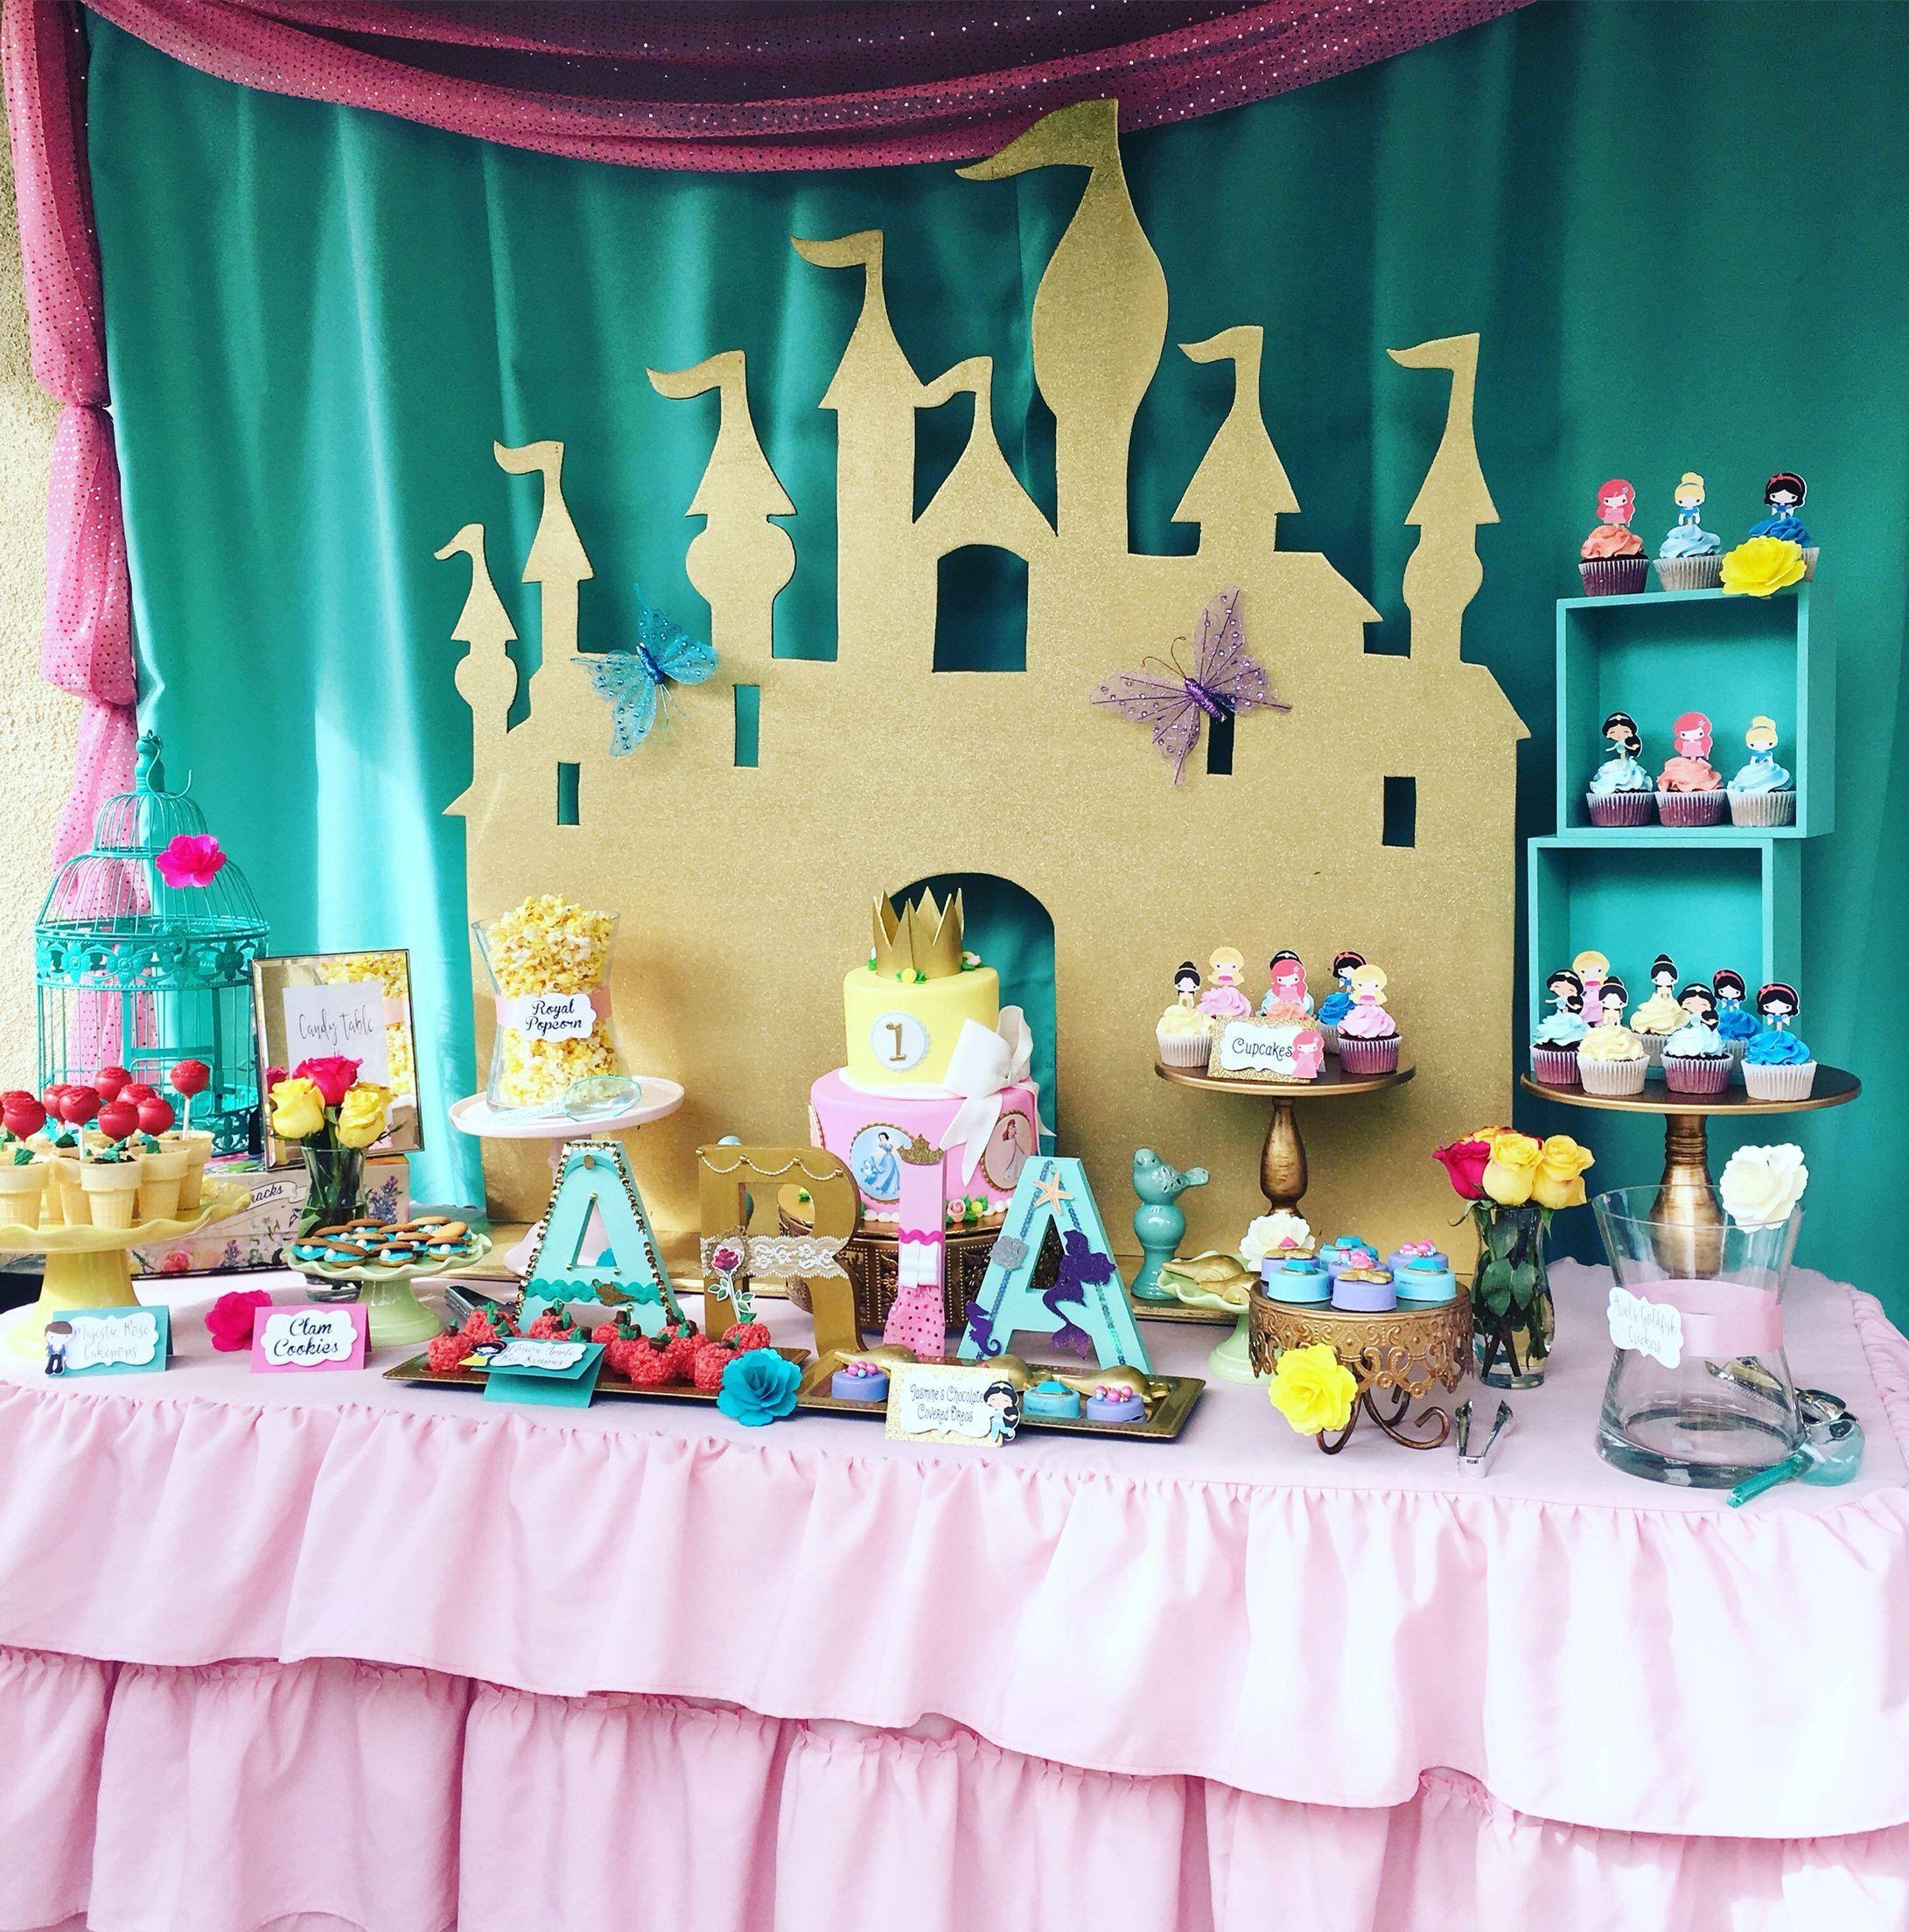 Cake Table Decorating Ideas Best Of Disney Princess Inspired Dessert Table Princess Birthday Party Decorations Princess Theme Party Princess Party Decorations